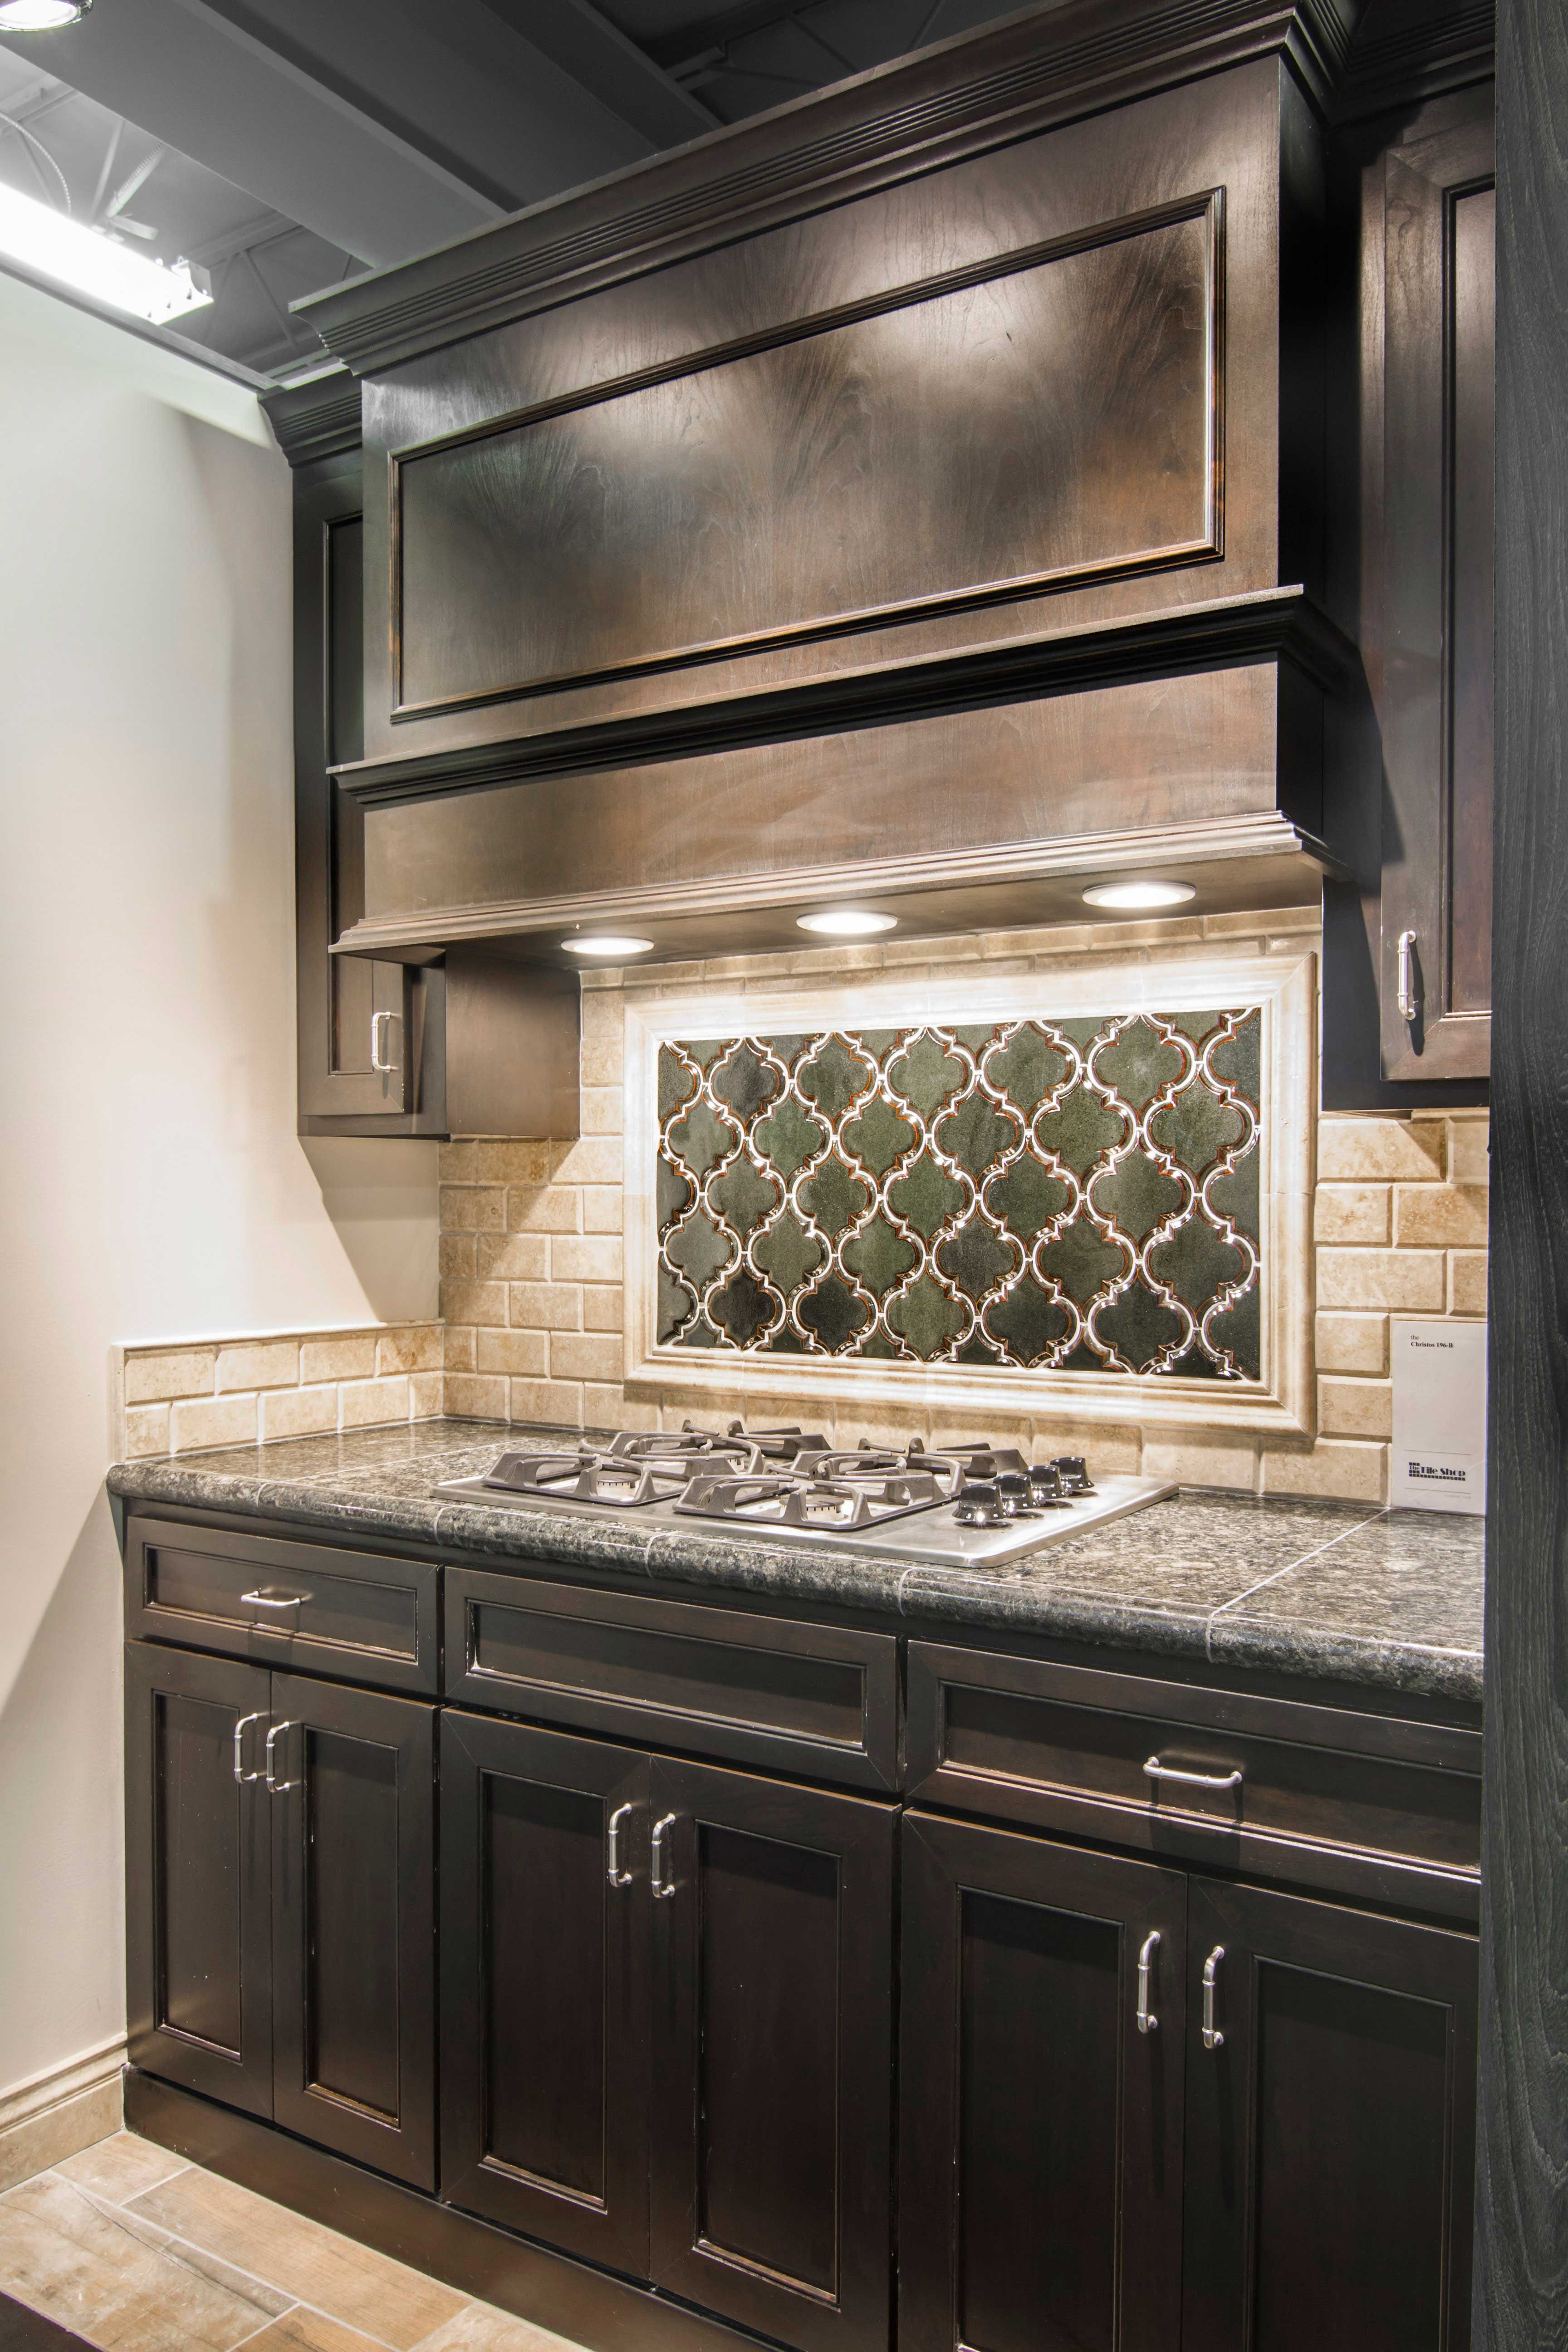 Arabesque design kitchen backsplash tile Artisan